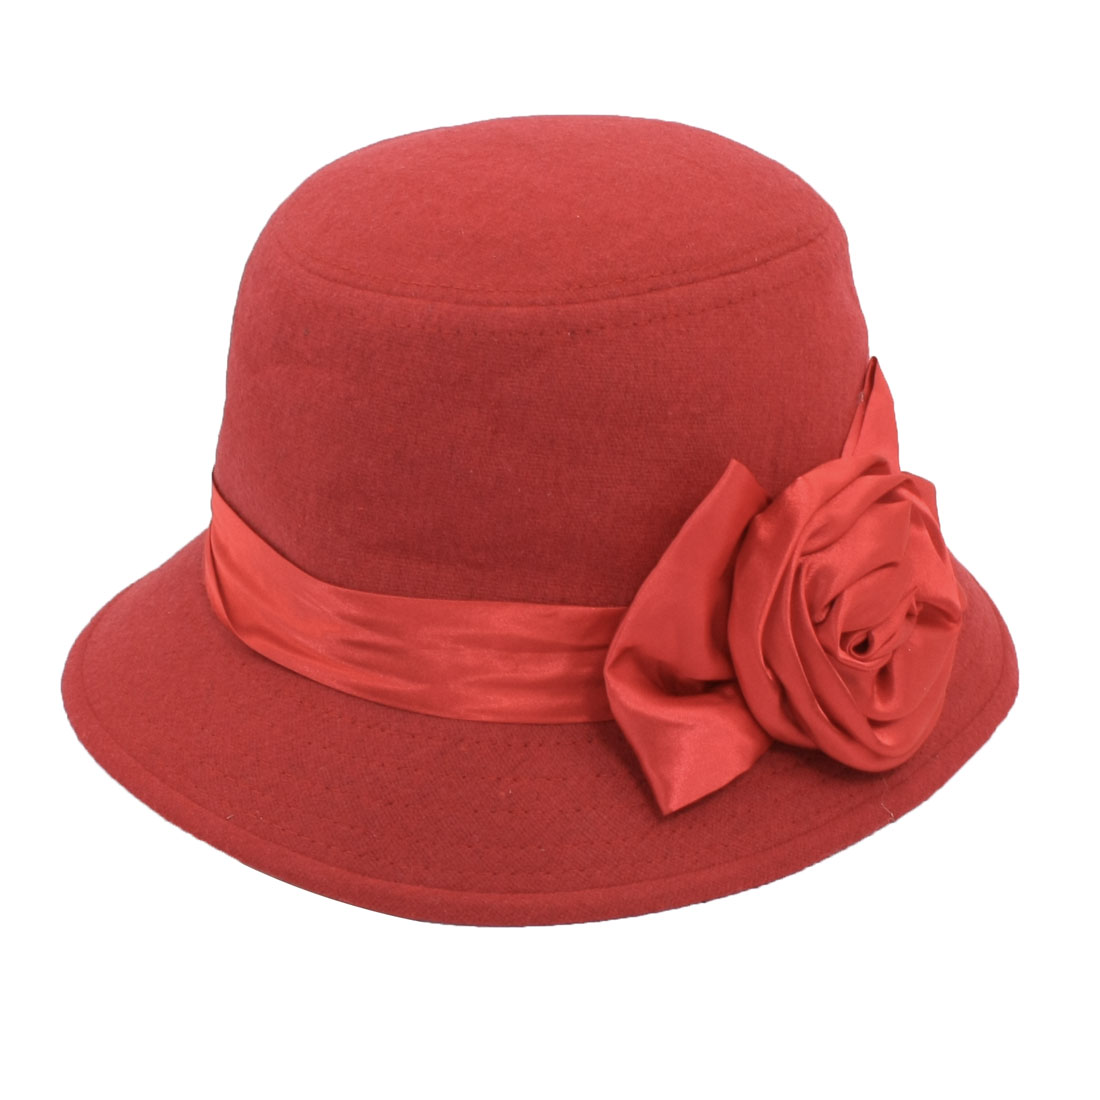 Ladies Women Outdoor Rose Ribbon Decor Red Cloche Bucket Bell Hat